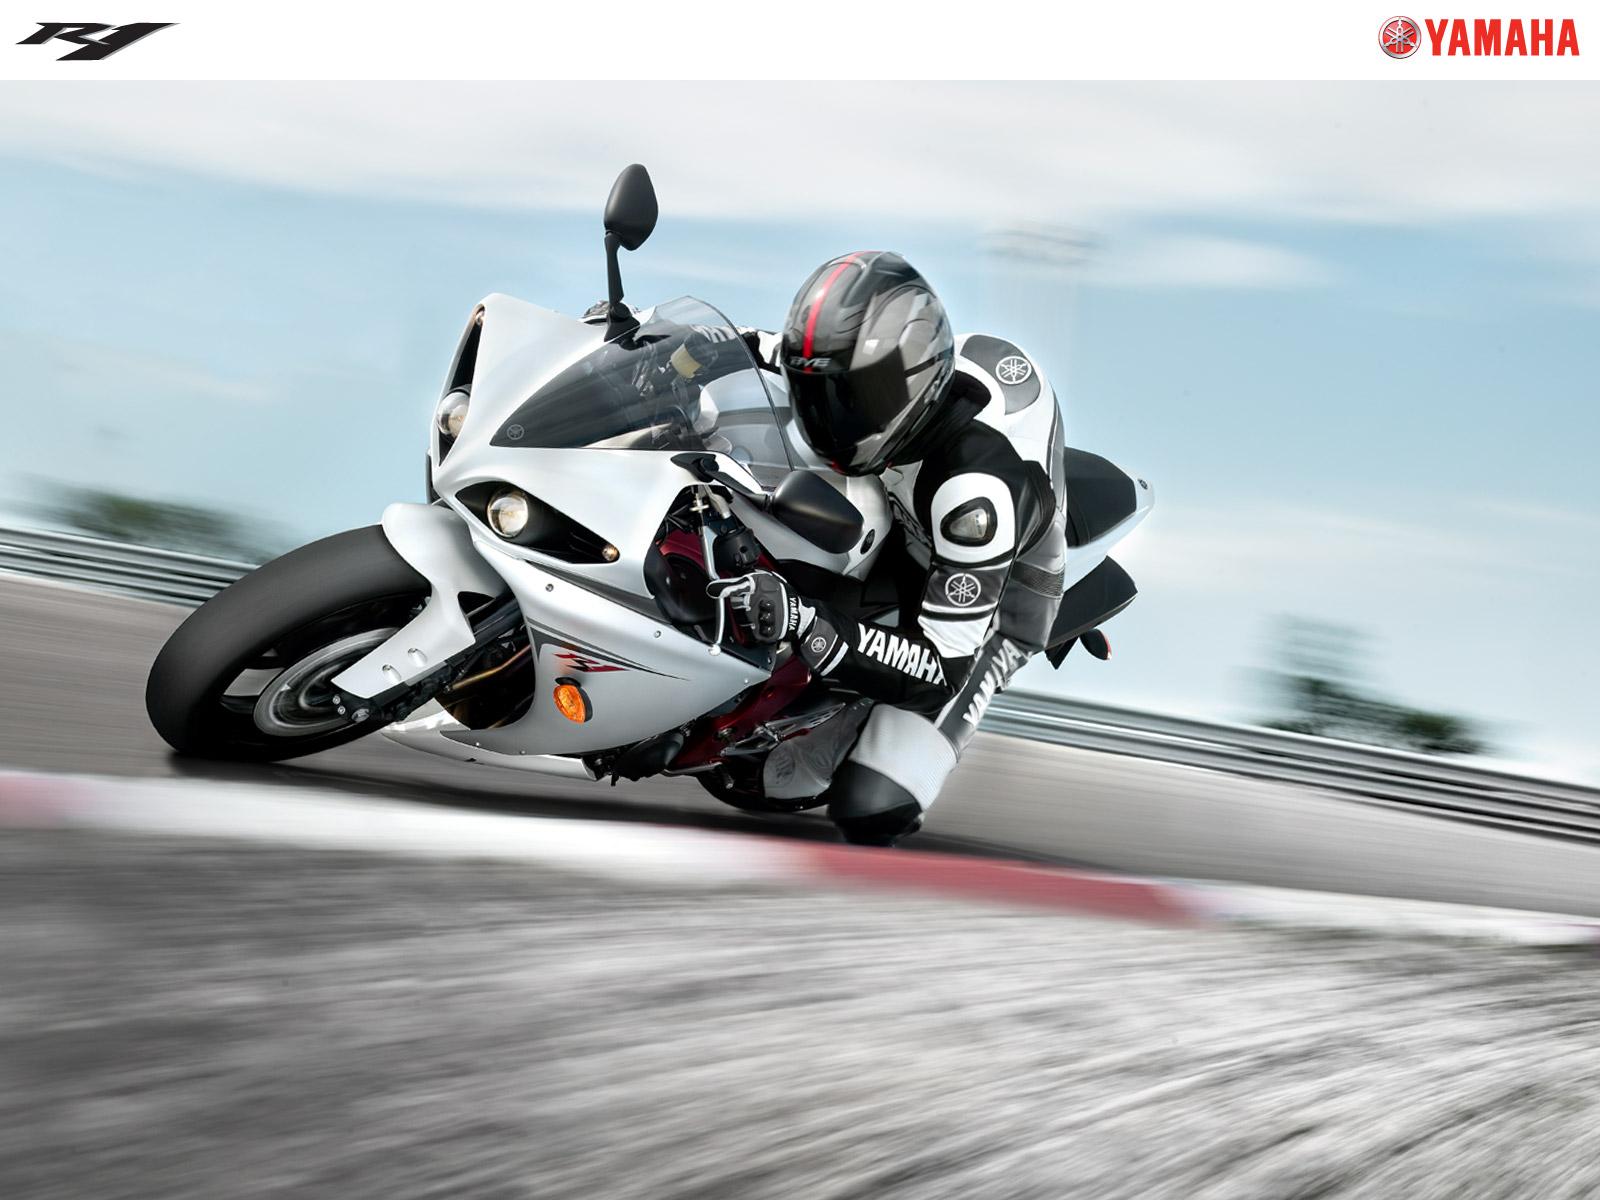 Motos Wallpapers Yamaha YZF R1 Wallpapers 1600x1200